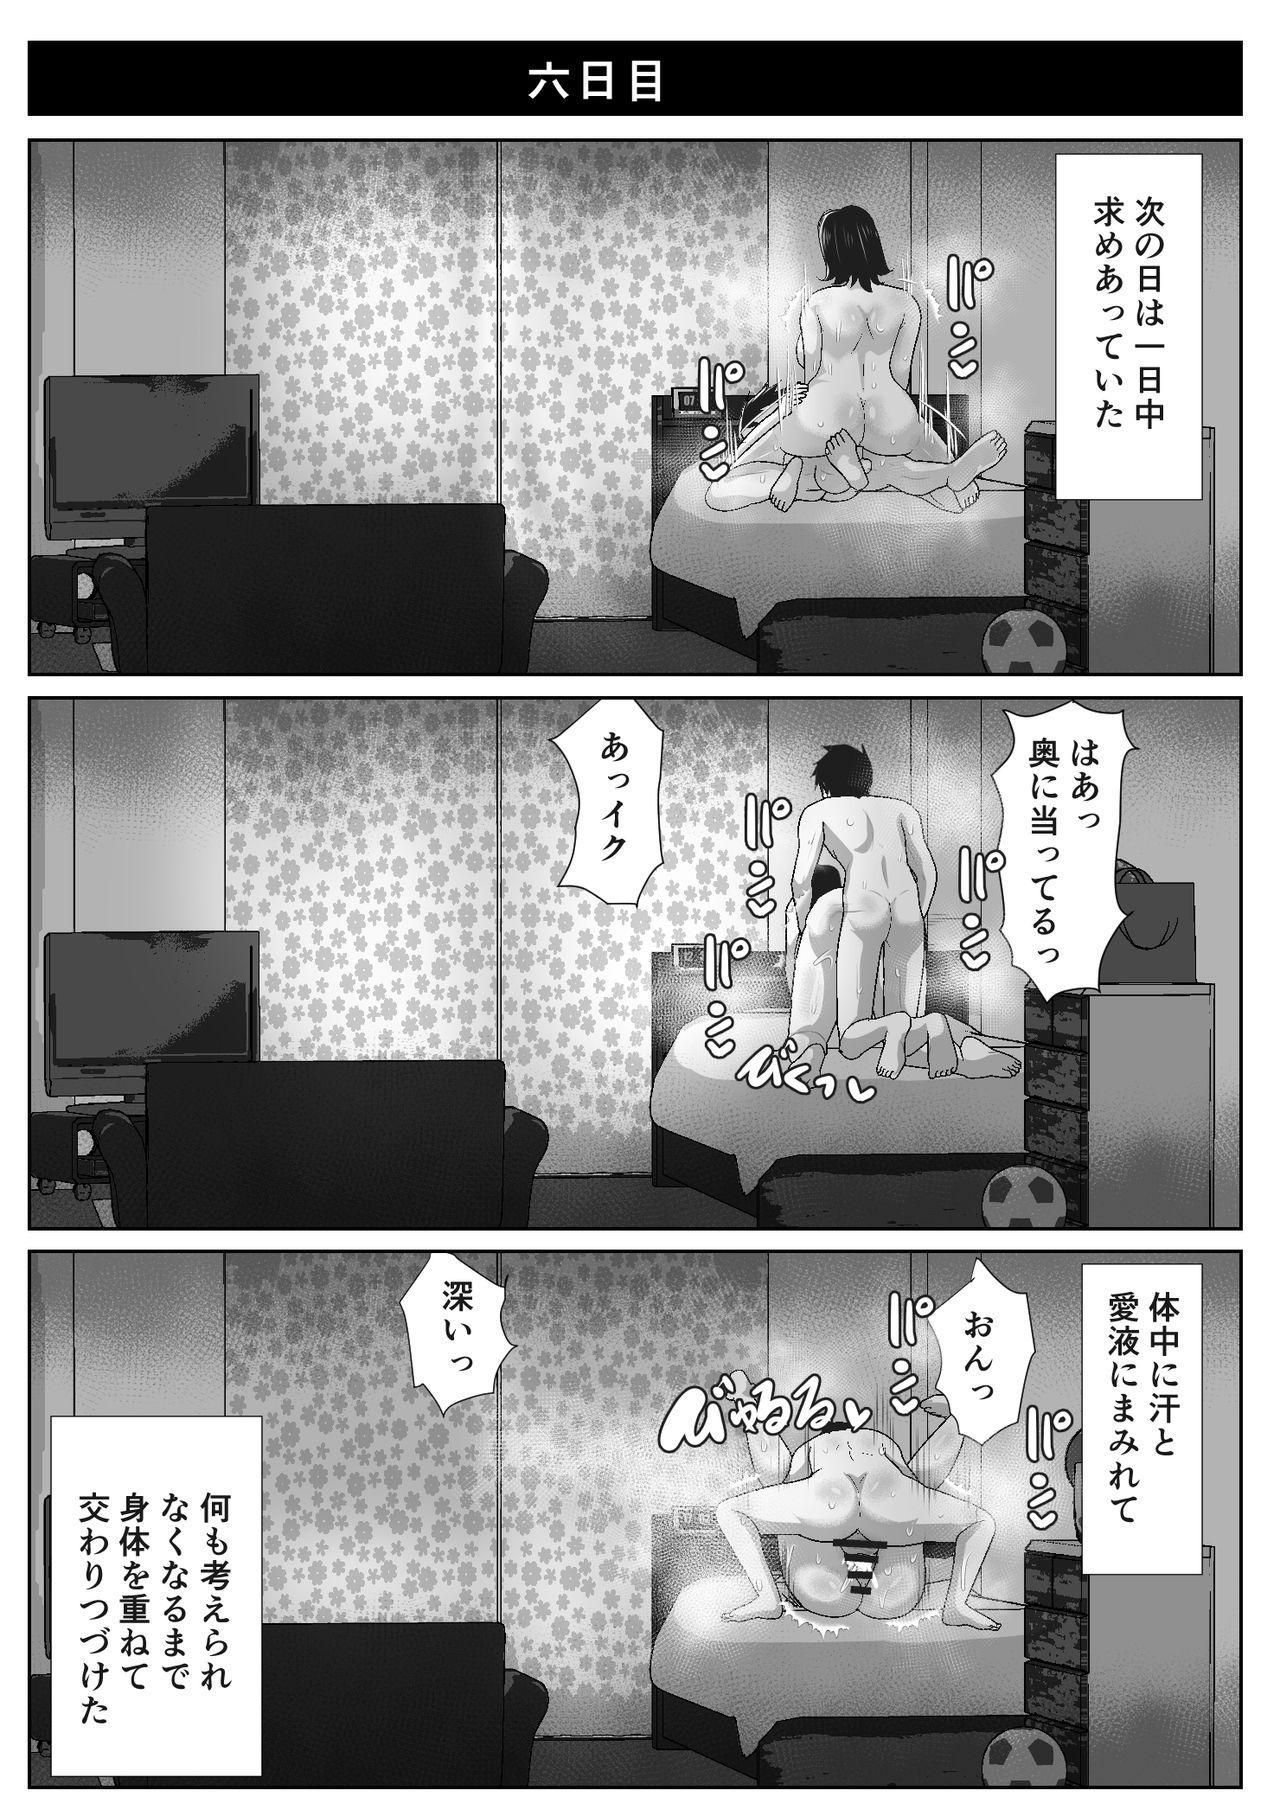 Kaa-san to Atsui Isshuukan 31